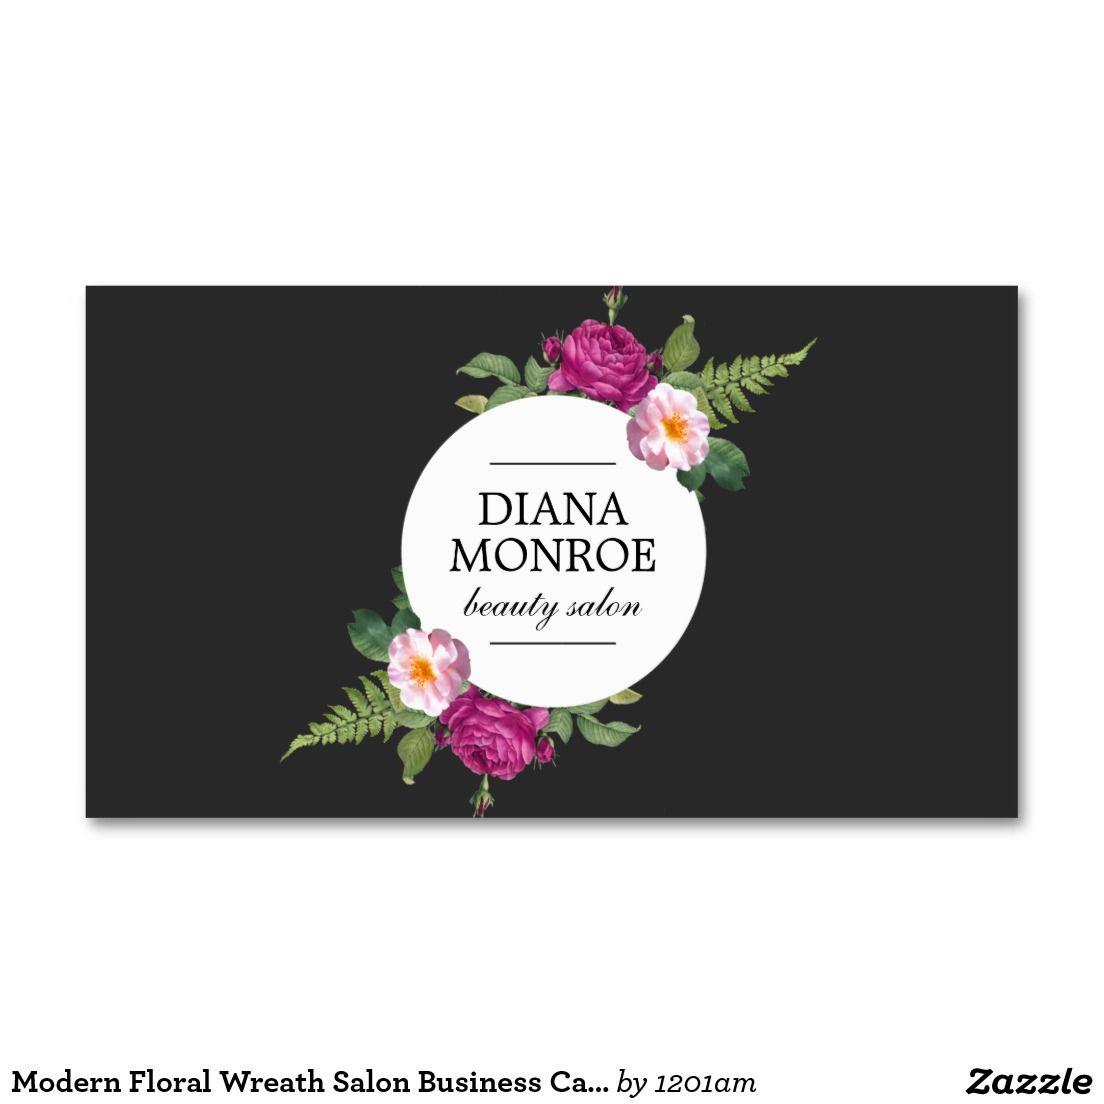 Modern Floral Wreath Salon Business Card   Floral wreath, Card ...